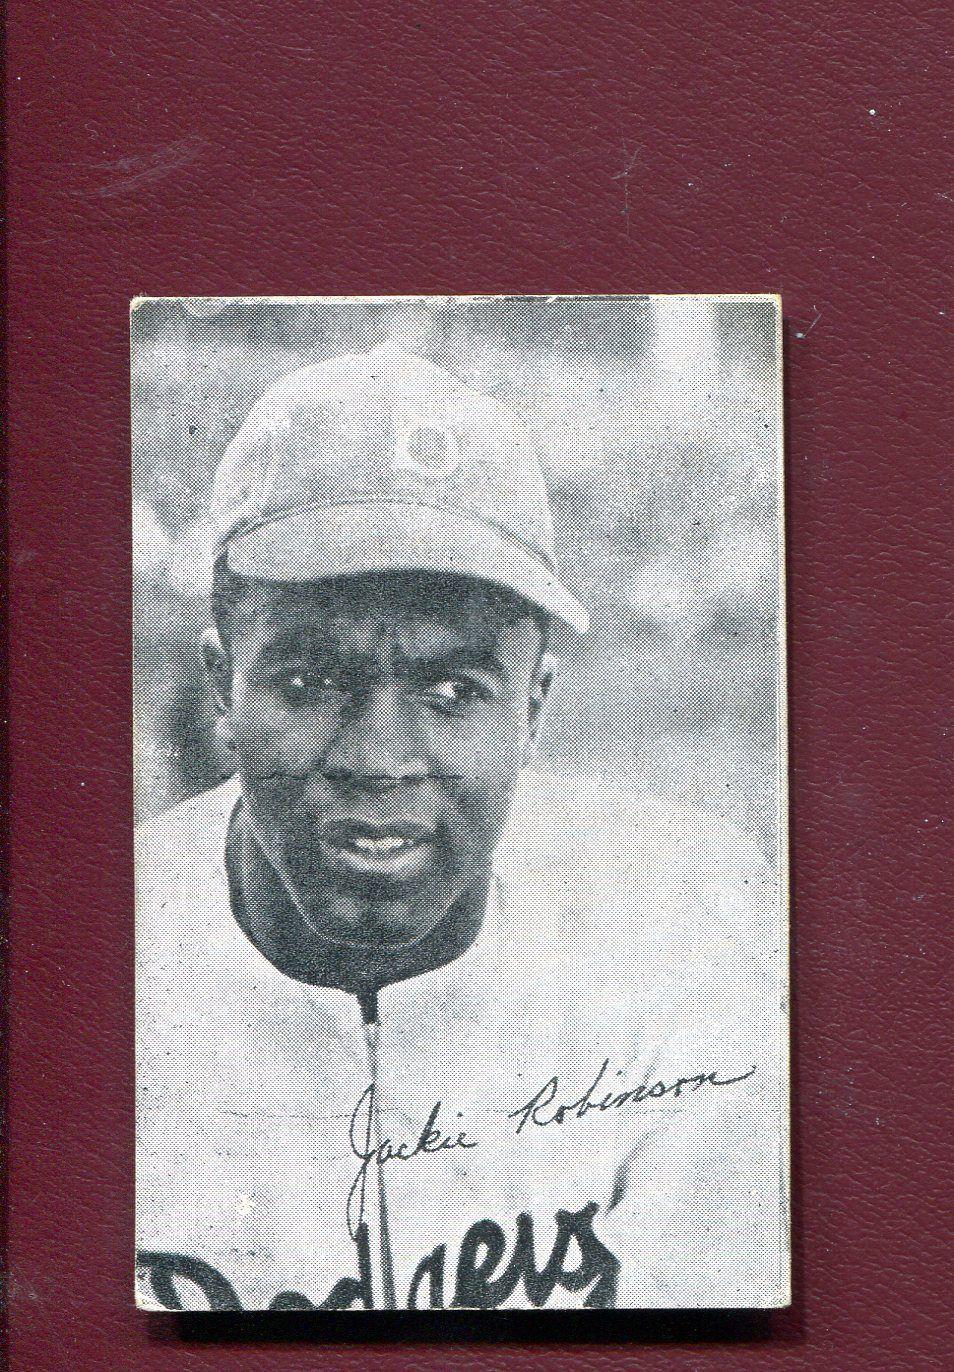 1947 W571 HOMOGENIZED BREAD JACKIE ROBINSON BASEBALL CARD..ORIGINAL!!!